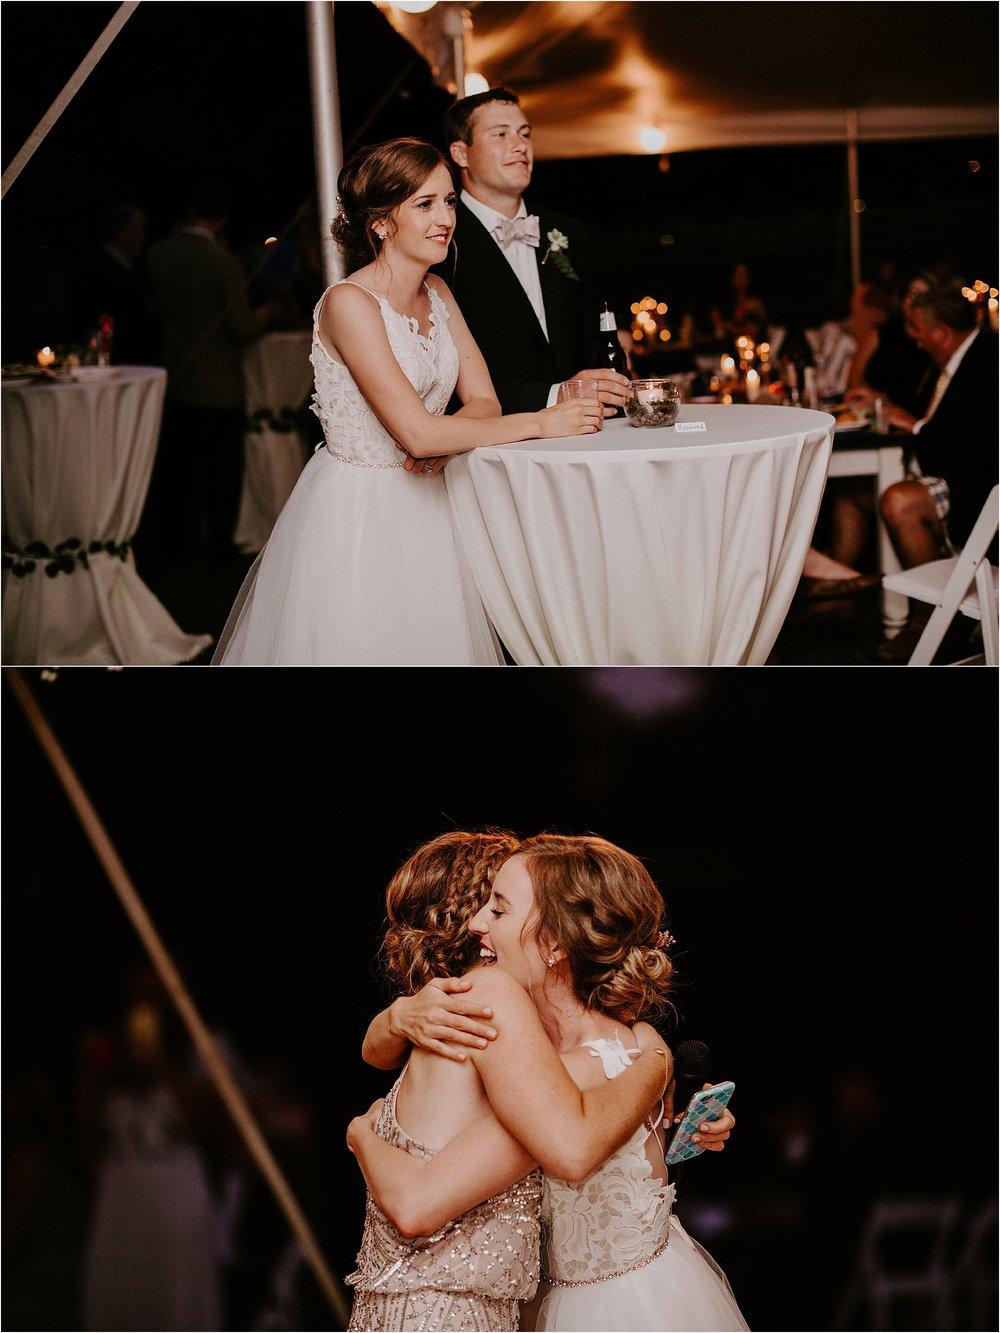 Sarah_Brookhart_Lancaster_Wedding_Photographer_0084.jpg